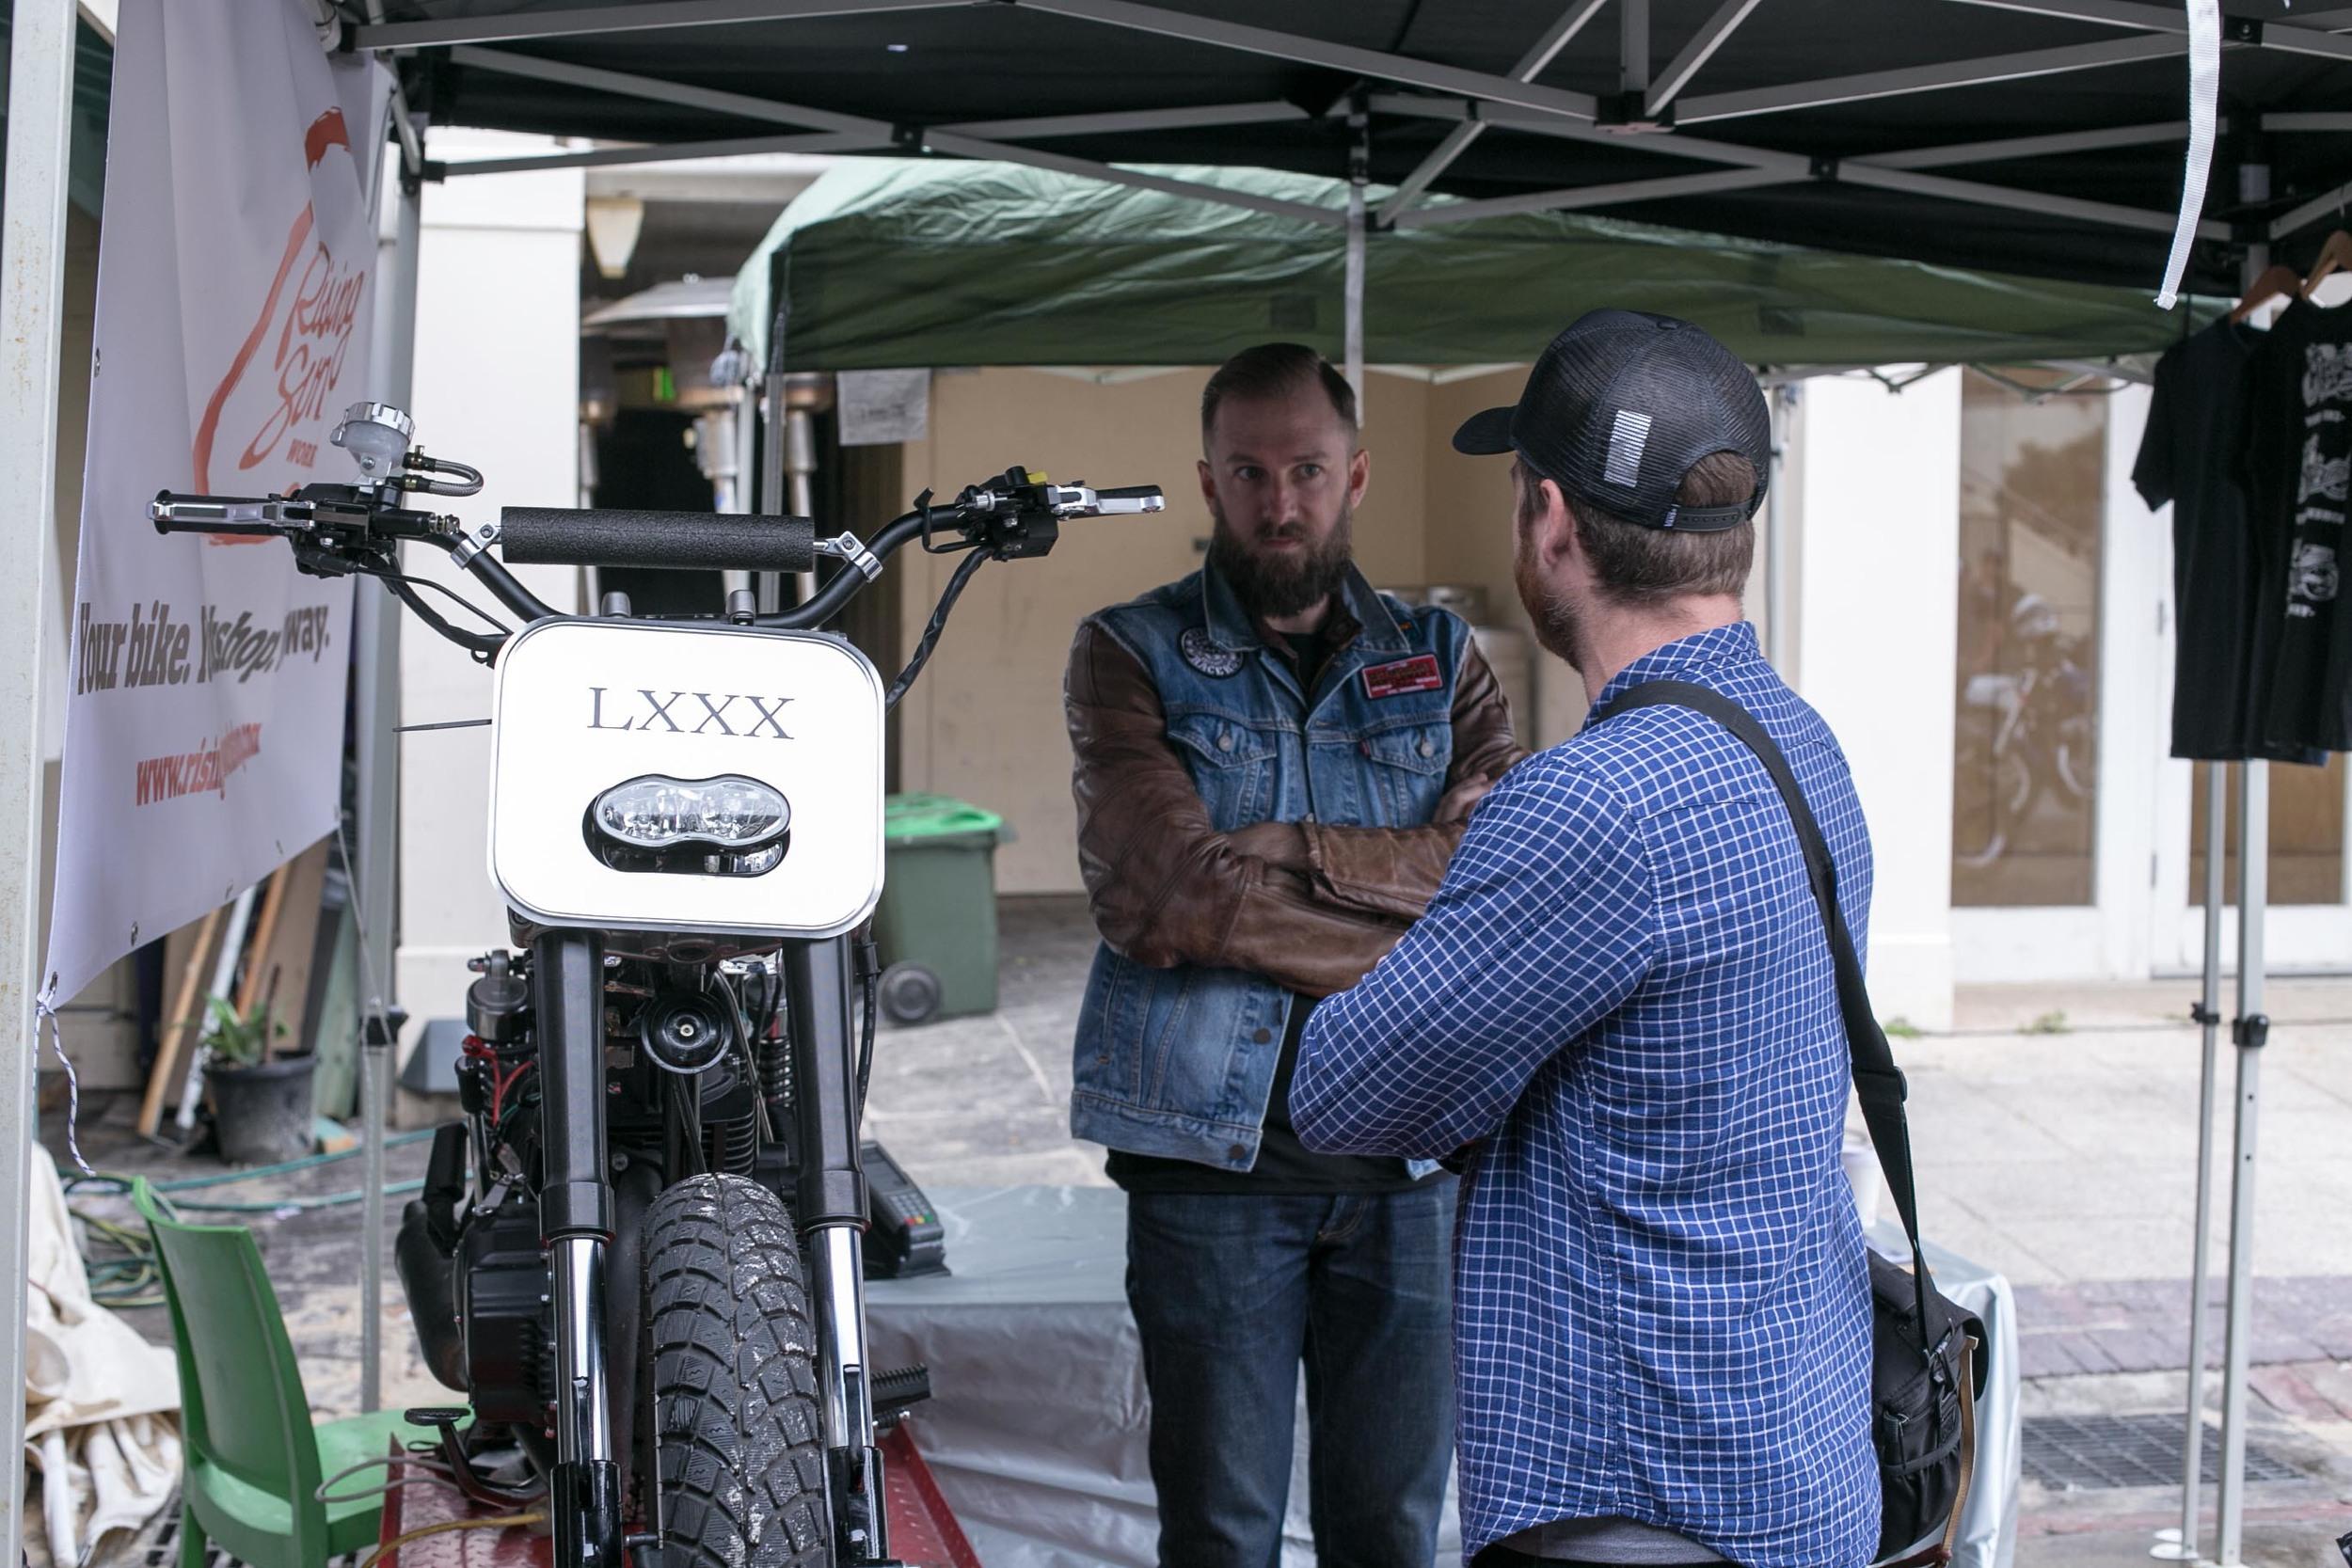 Rising_sun_workshop_deus_bike_build_off_sydney-52.jpg